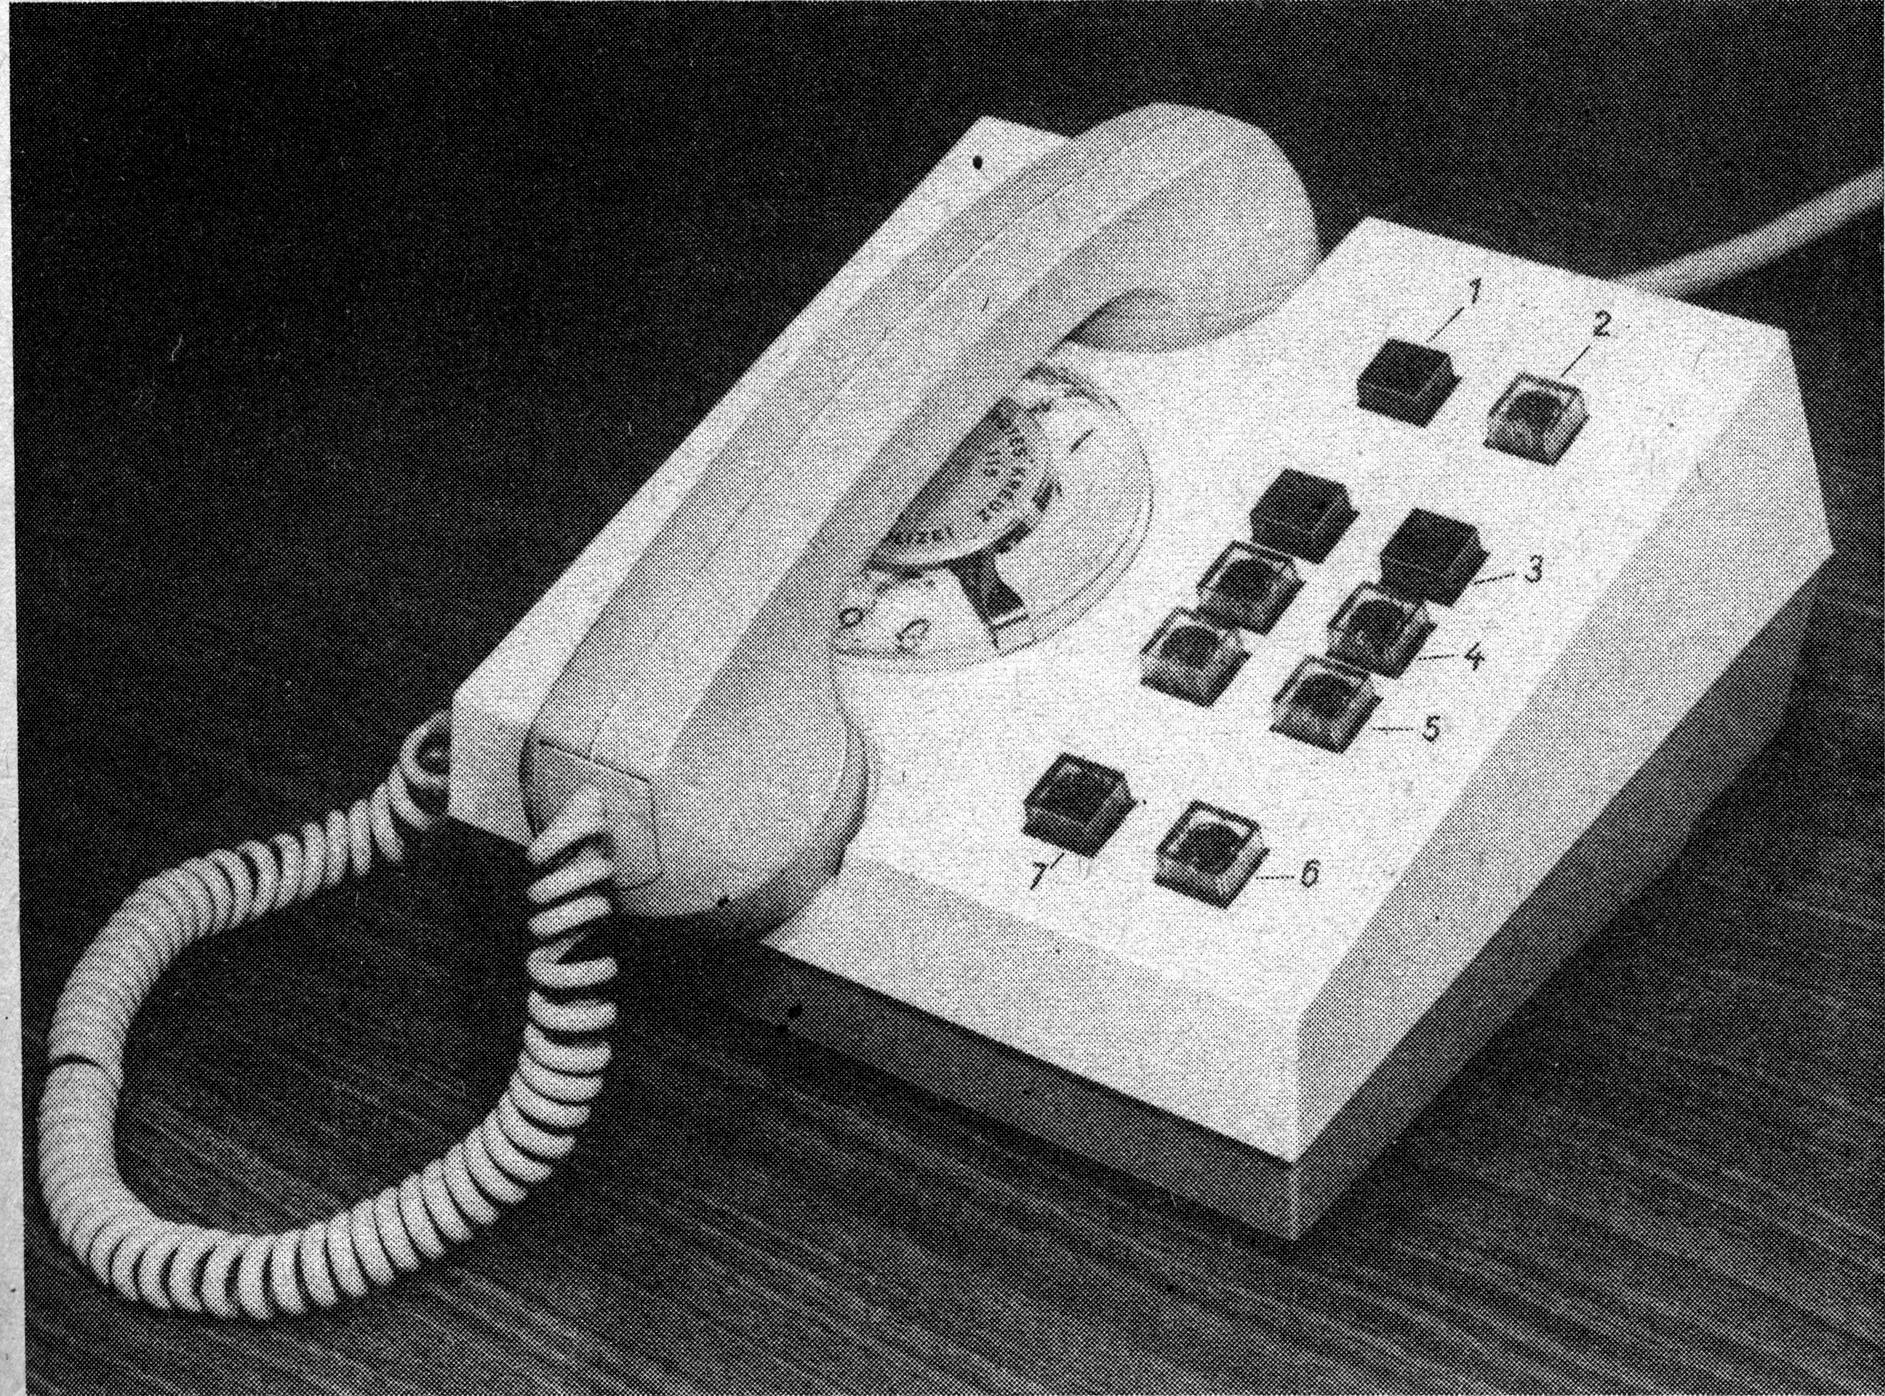 about communication. : CTRL C